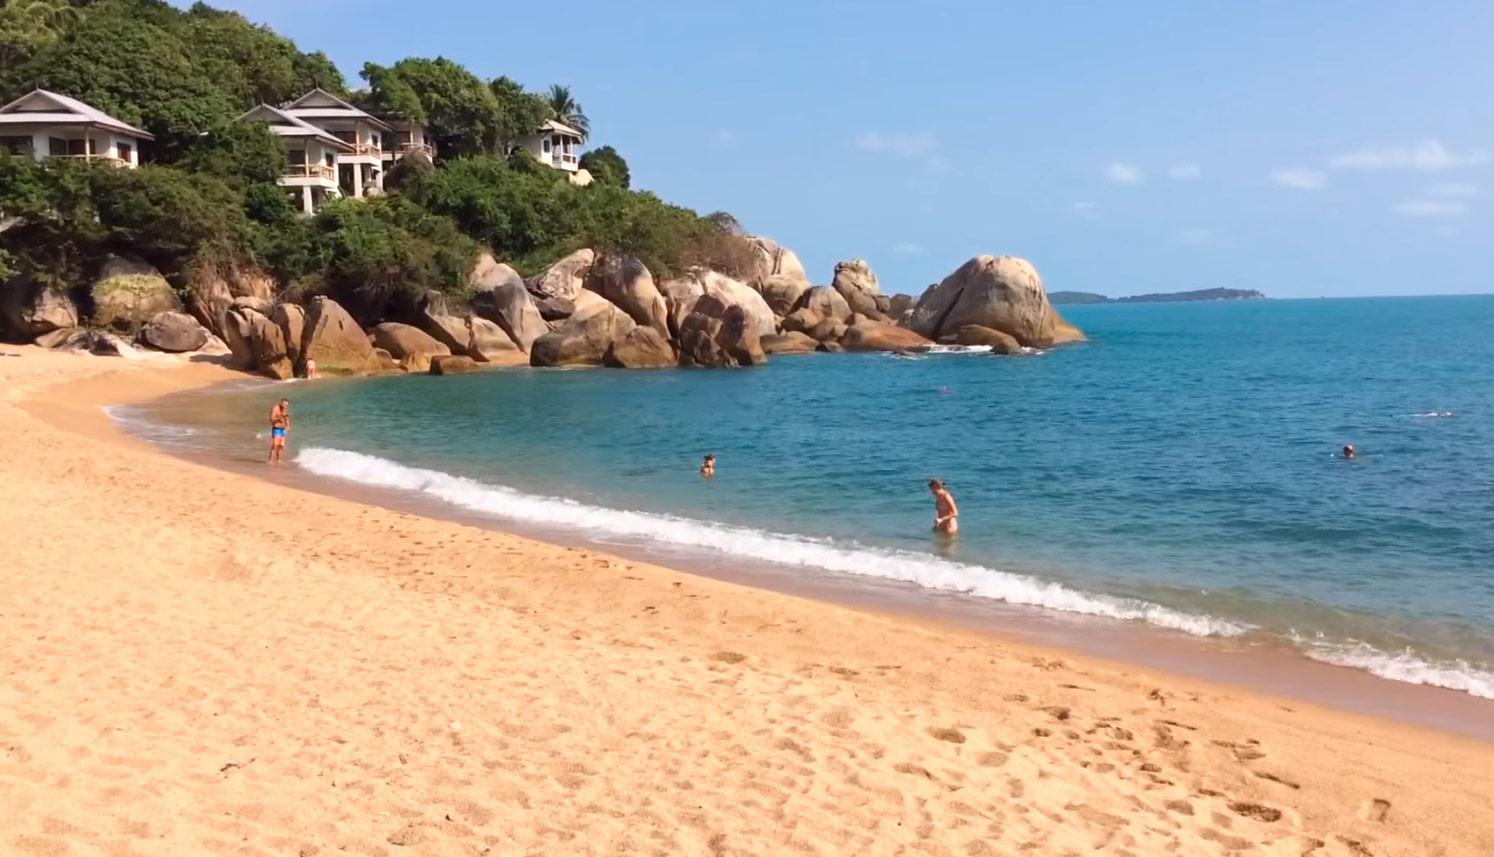 Пляж Корал Ков (Coral Cove Beach)